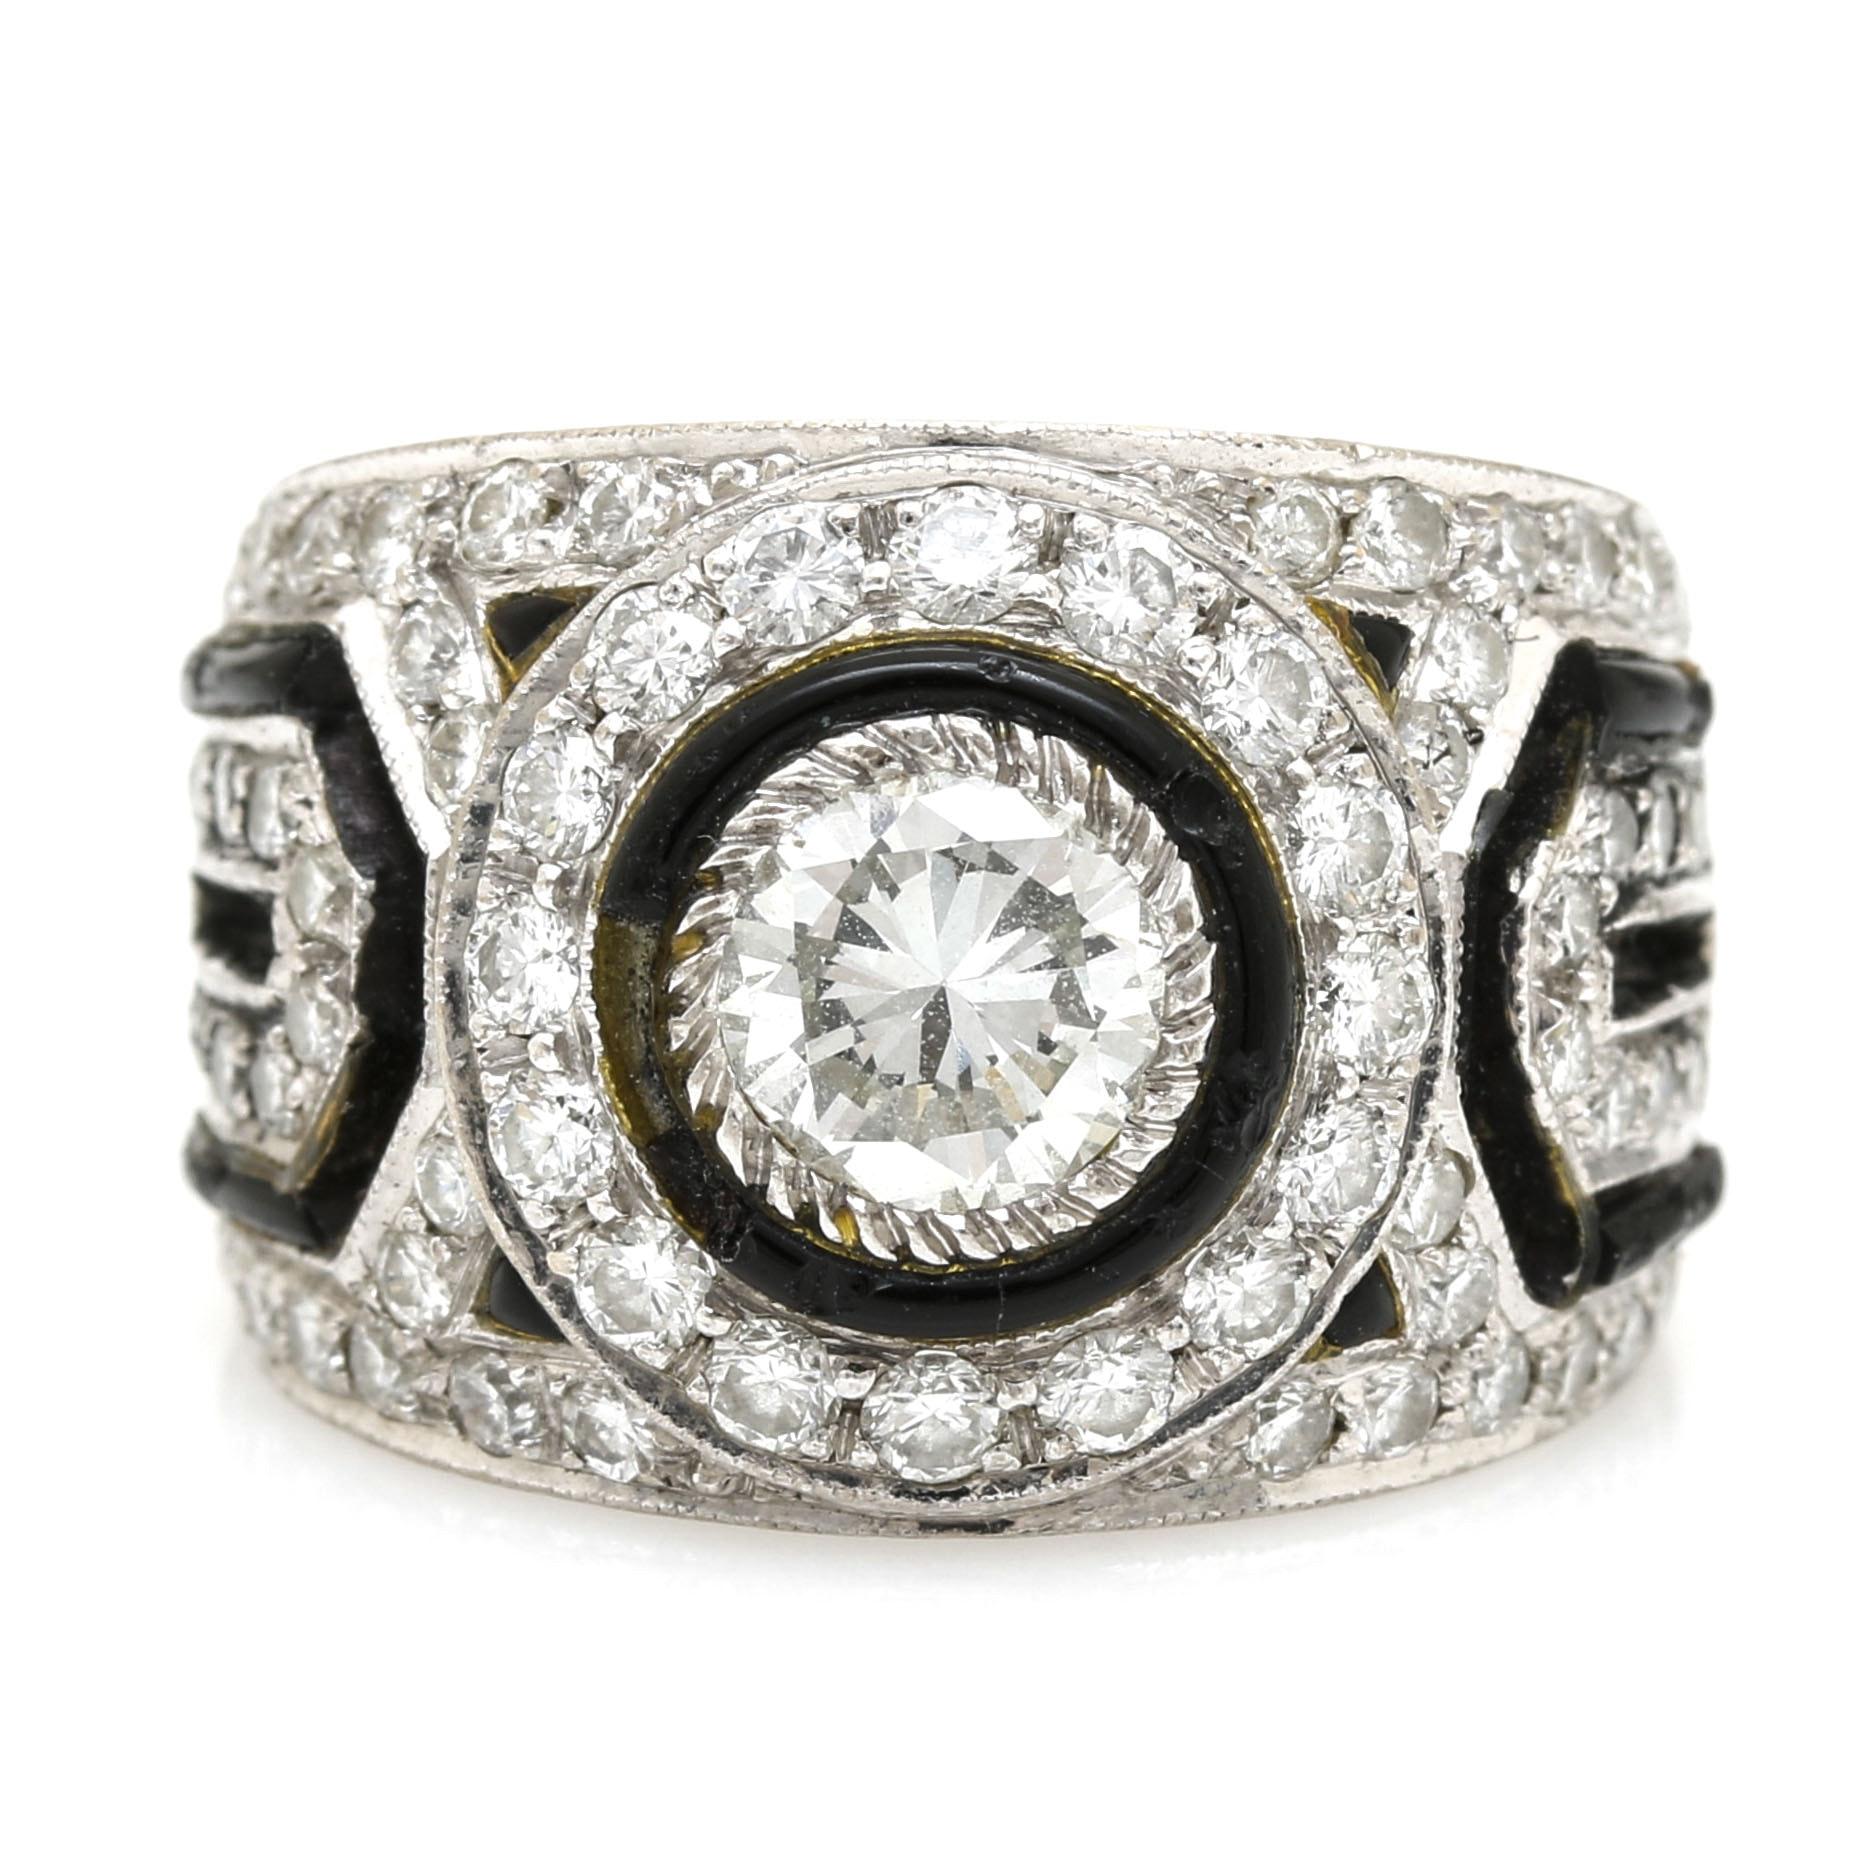 Art Deco-Style 18K White Gold 1.50 CTW Diamond Ring